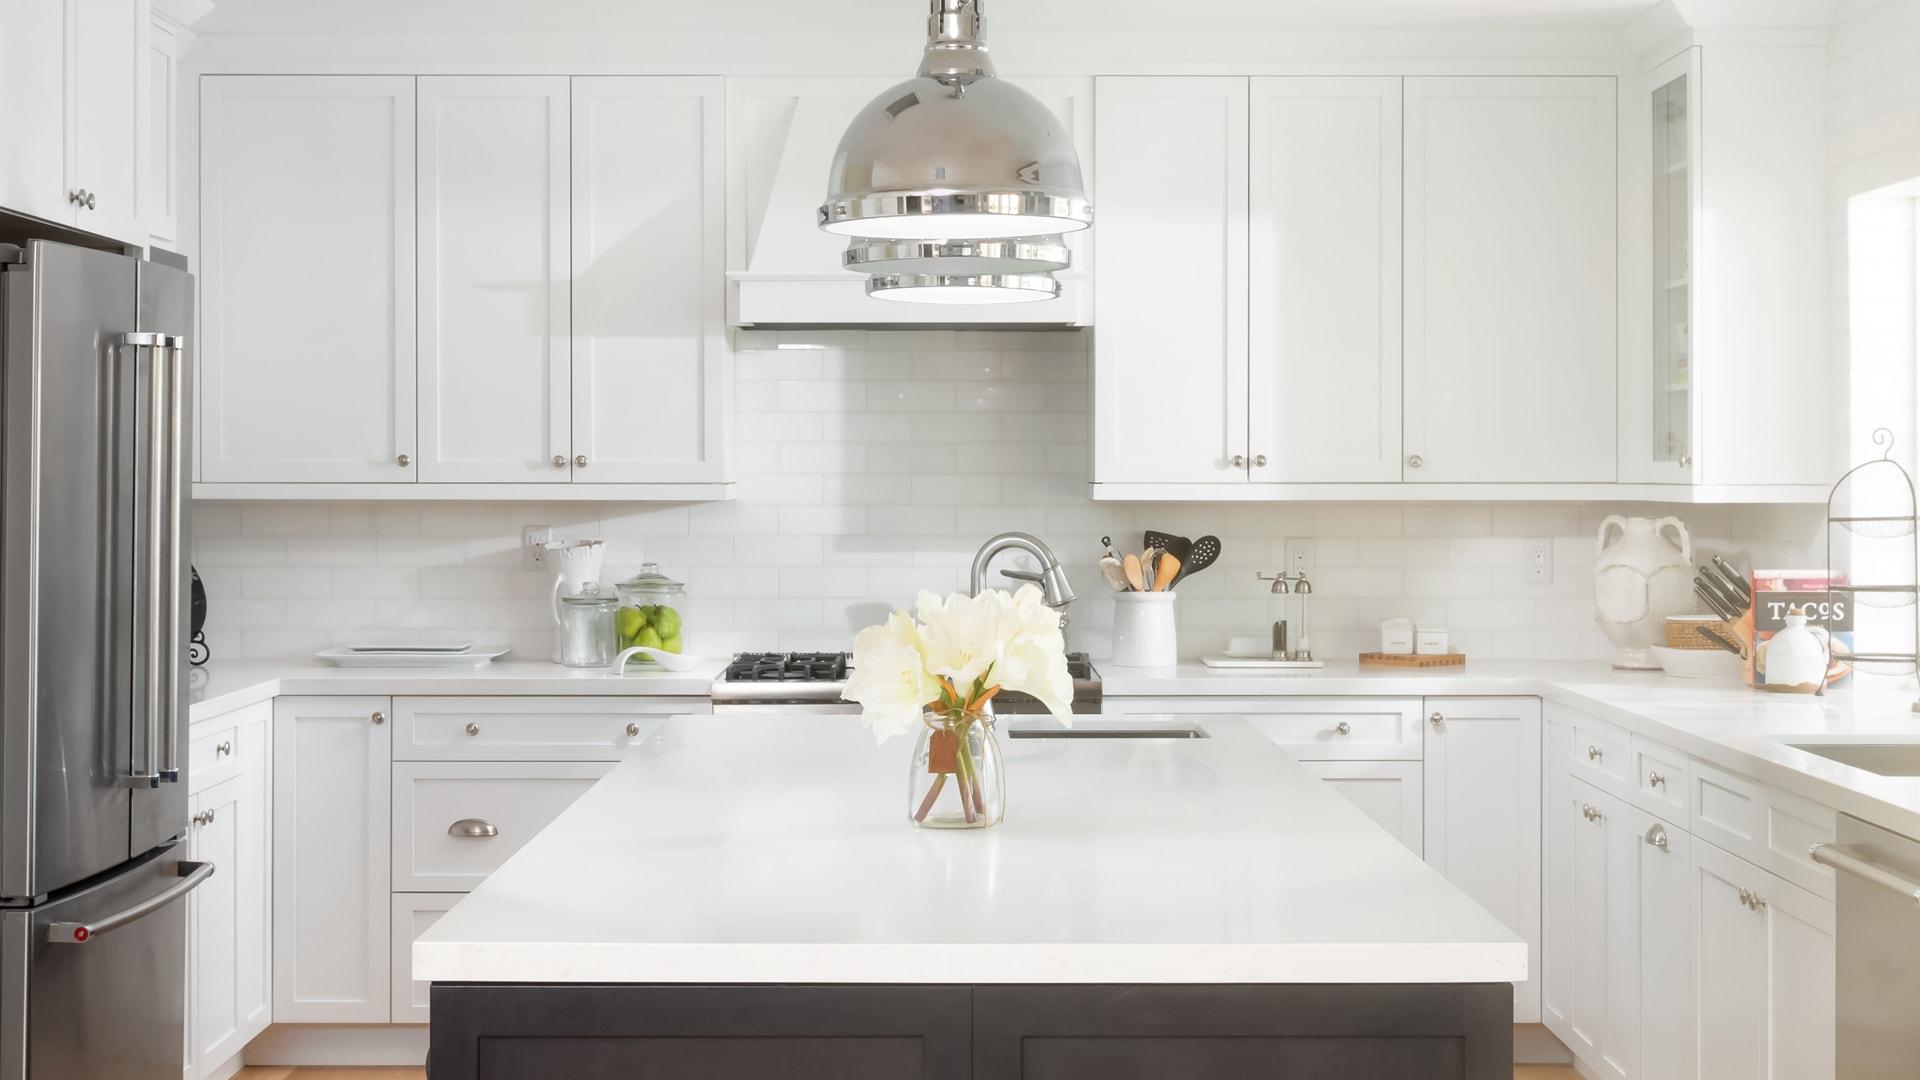 Superior Kitchen Cabinets Phoenix, Arizona U0026amp; Scottsdale   Cabinet Solutions USA